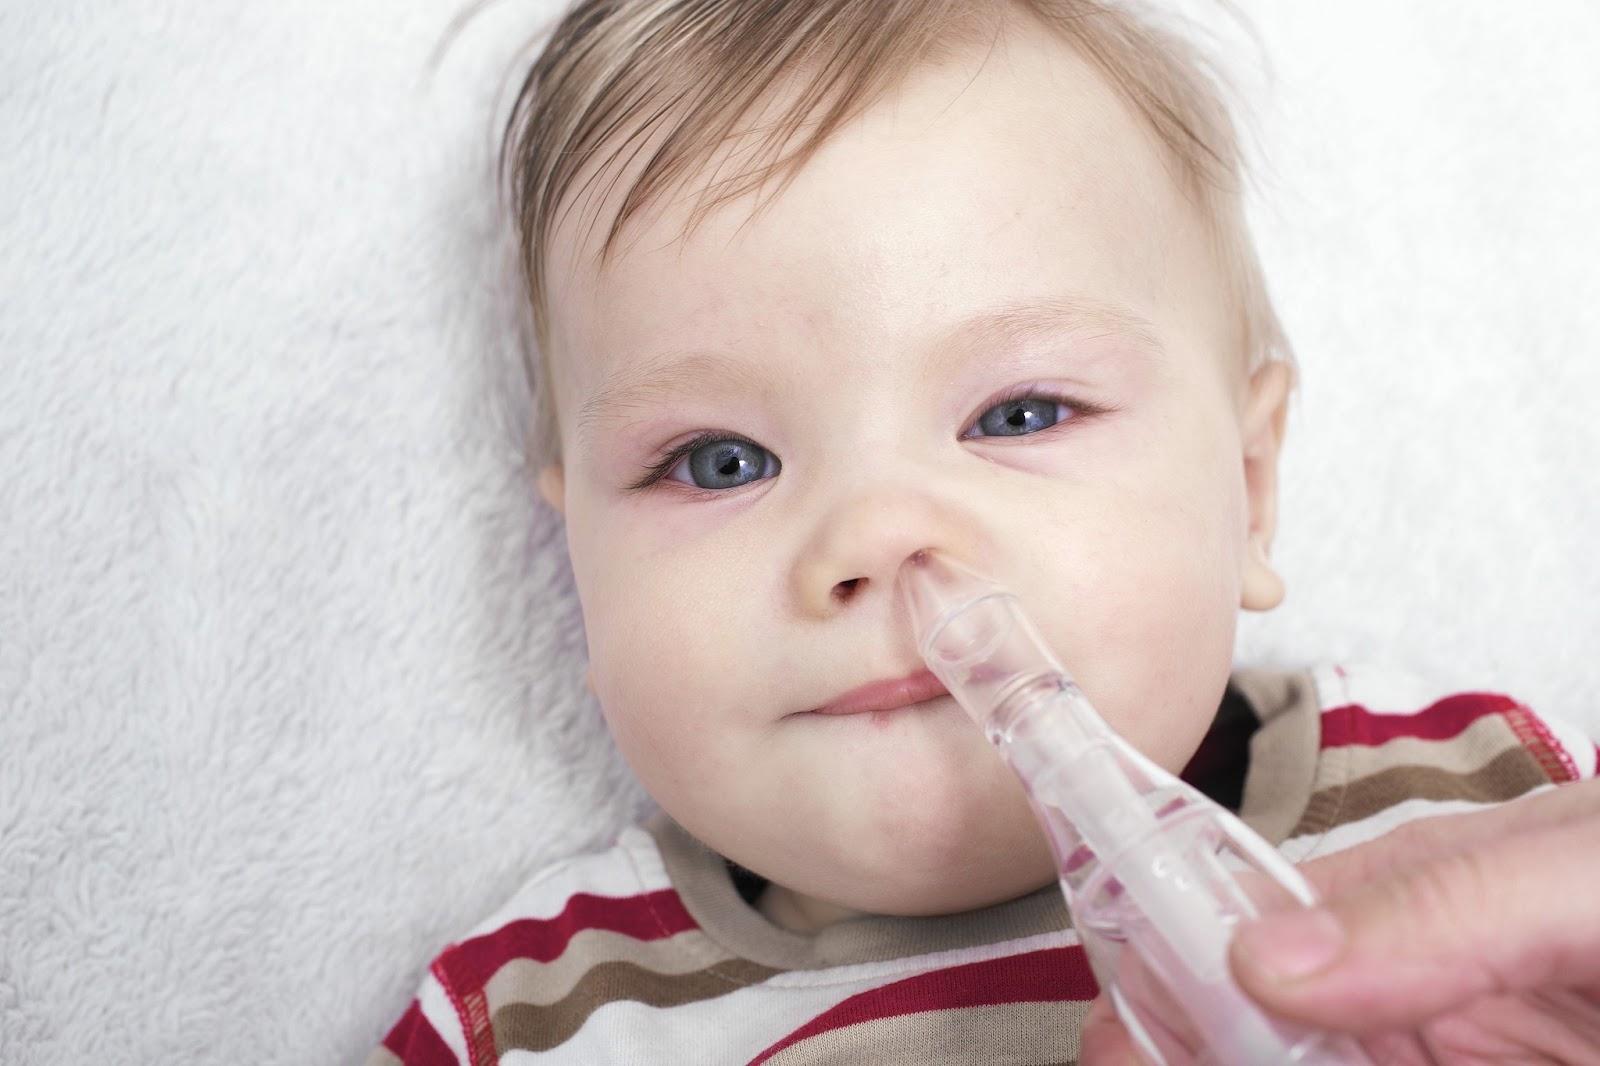 Newborn's cold – 'home fixes'